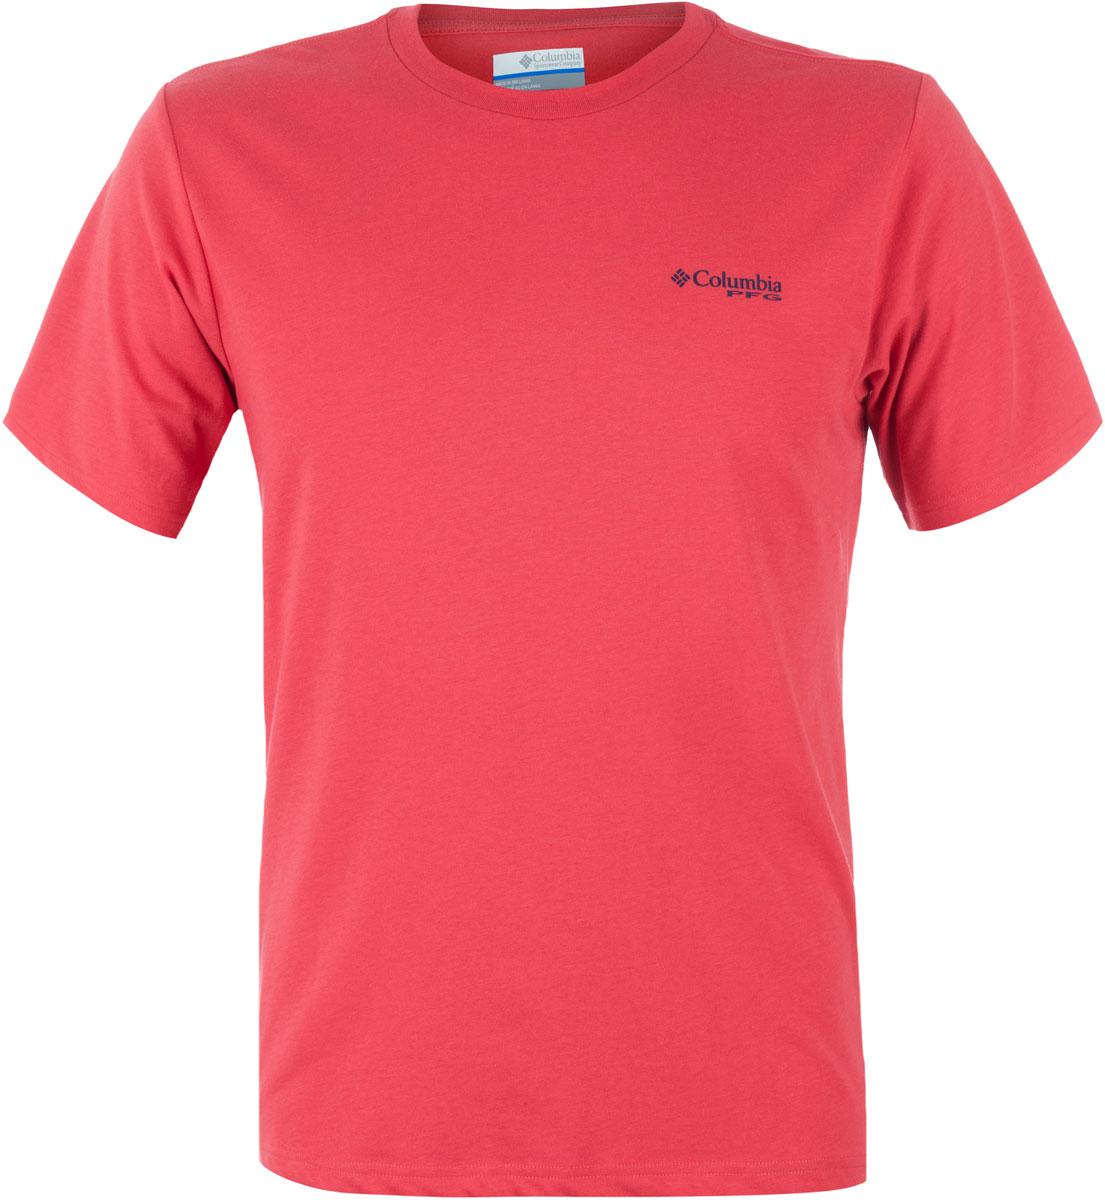 Футболка мужская Columbia PFG Elements Marlin II SS T-shirt, цвет: красный. 1717151-683. Размер XL (52/54)